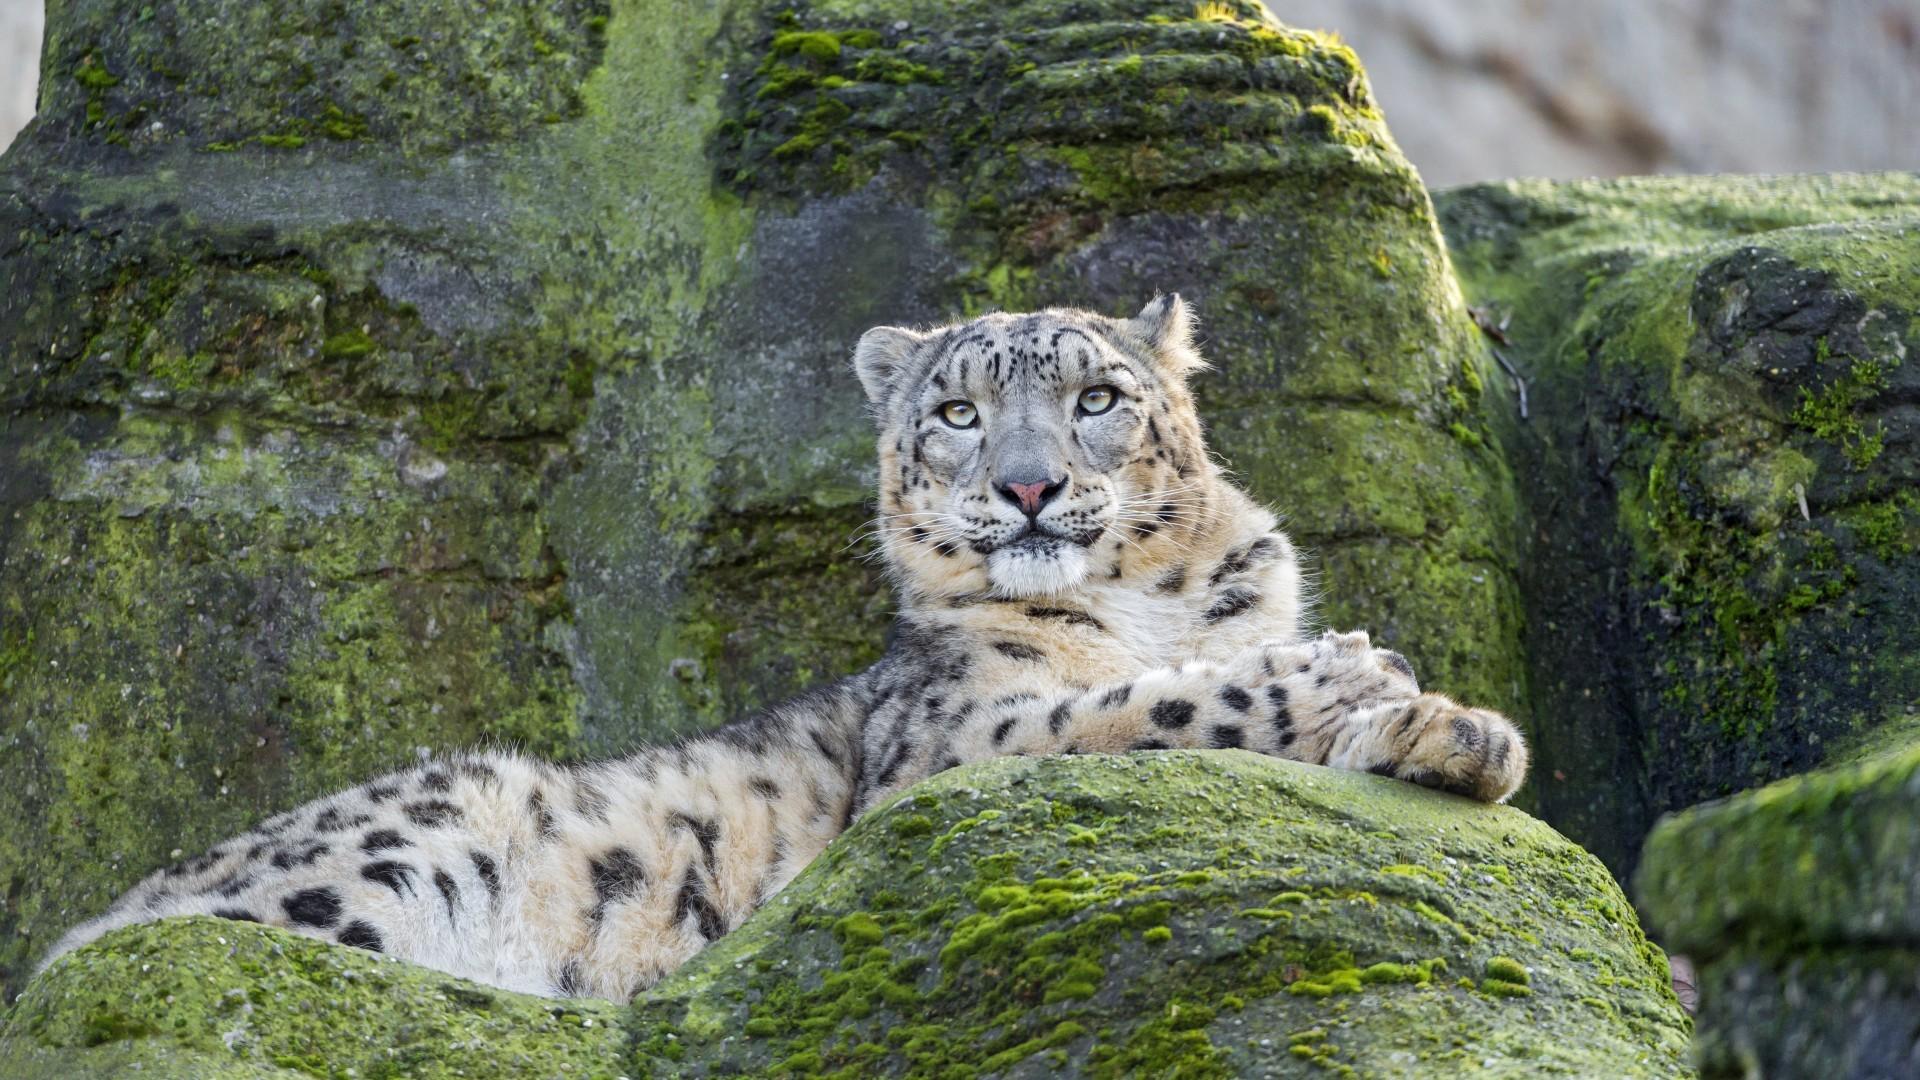 General 1920x1080 animals wildlife wild cat nature snow leopard